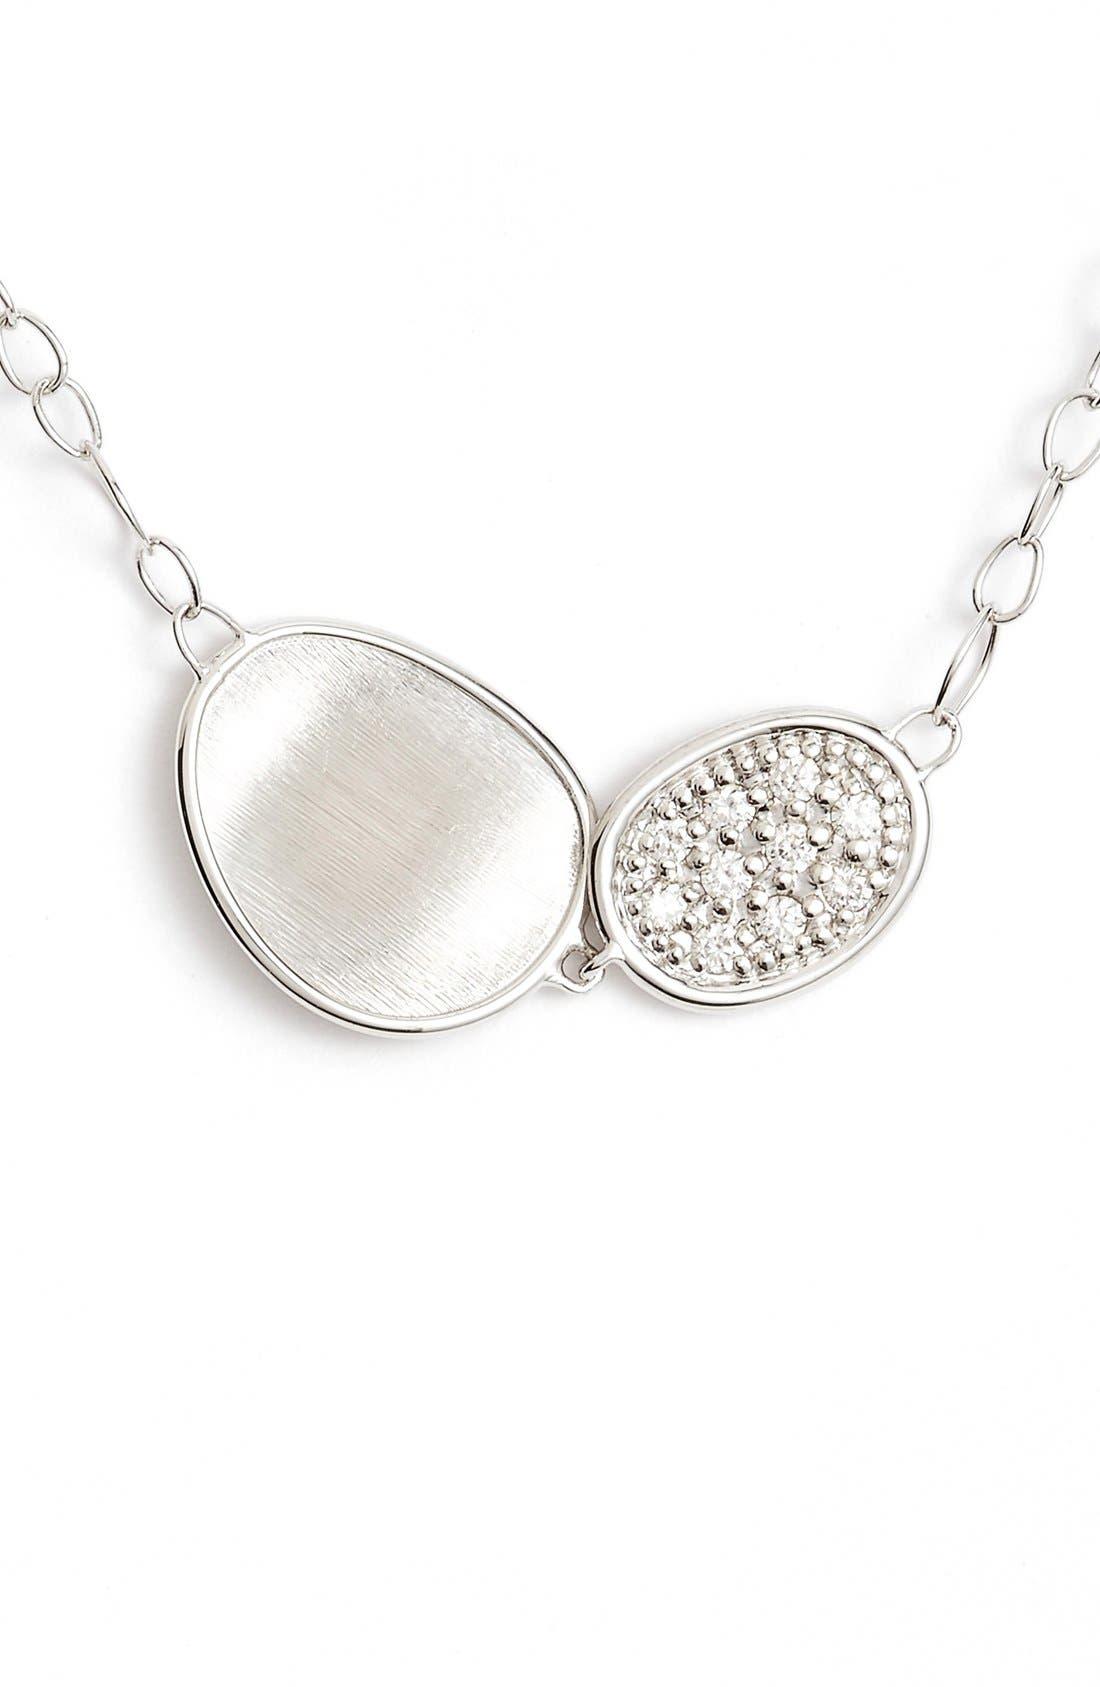 Lunaria Pendant Necklace,                             Main thumbnail 1, color,                             White Gold